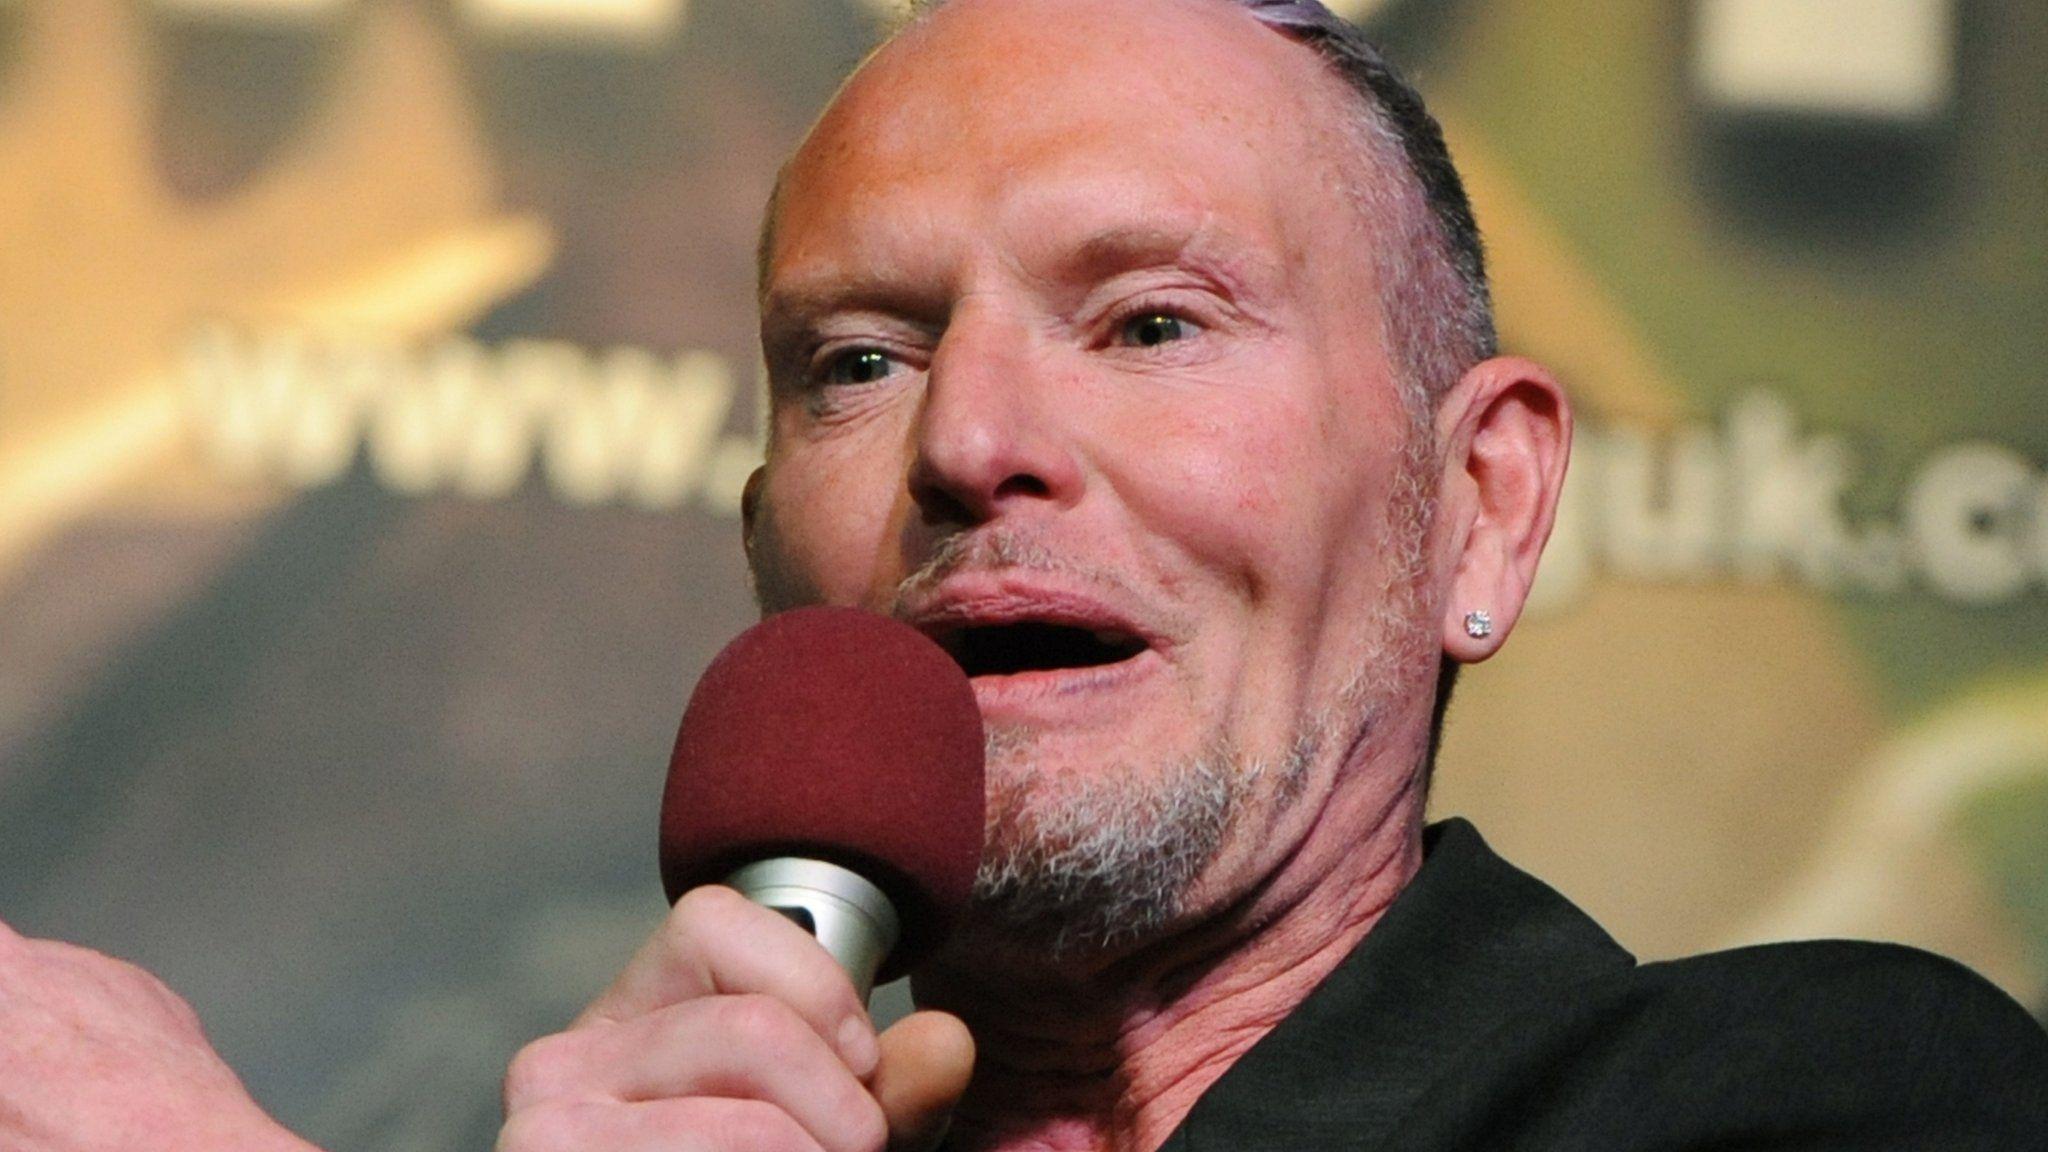 Paul Gascoigne at the Wolverhampton Civic Hall show